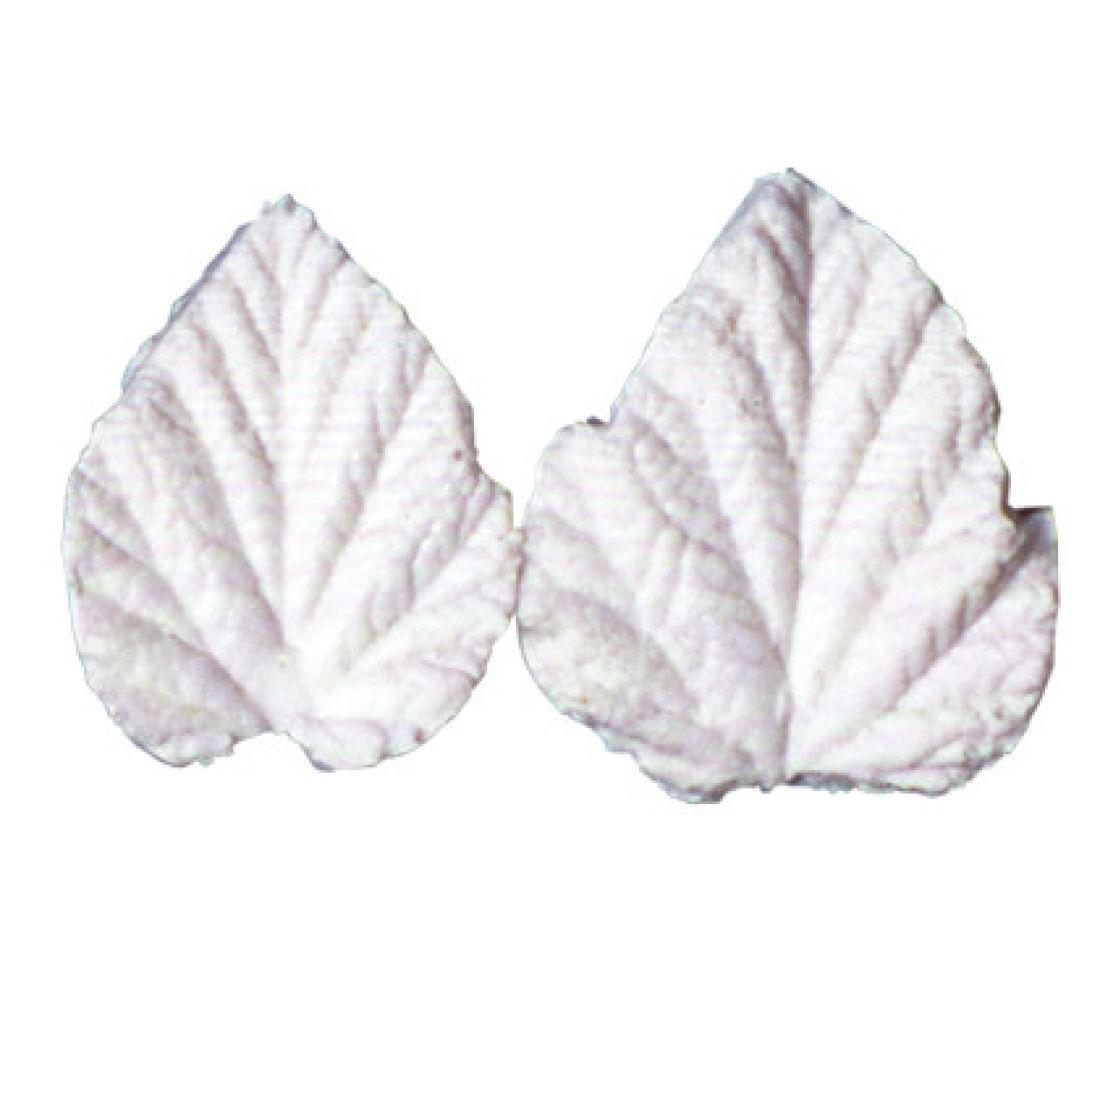 SK-GI Leaf Veiner Bramble- Wineberry 4.0/3.5cm Set of 2